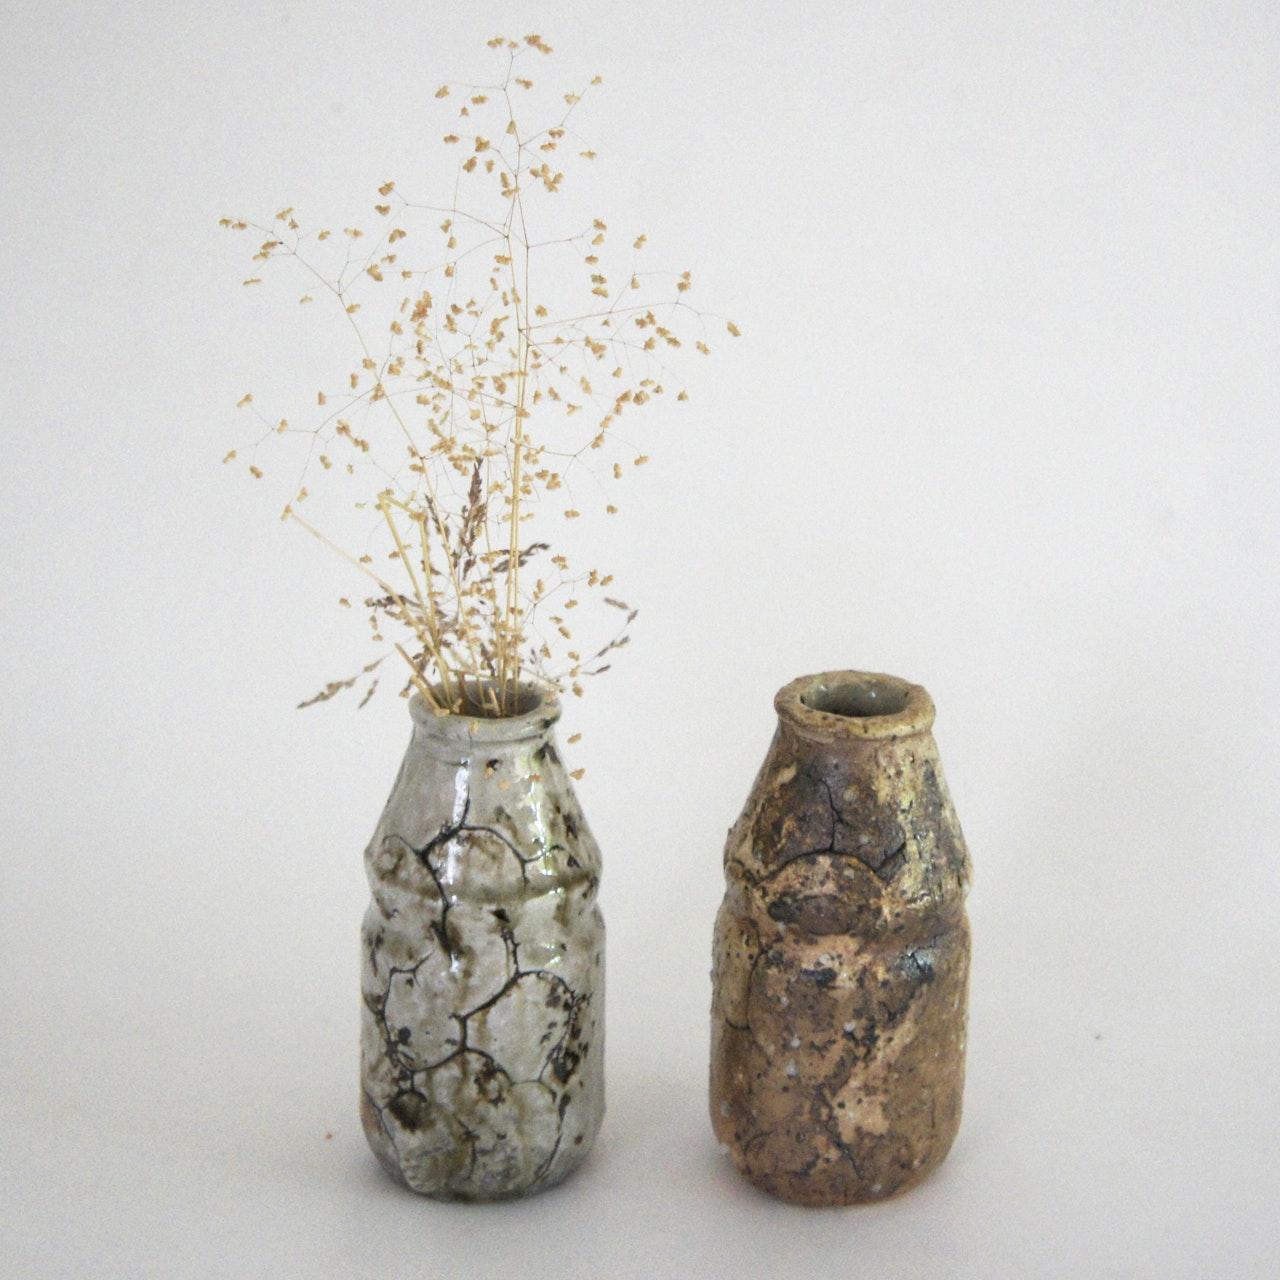 Shigaraki Small bottles